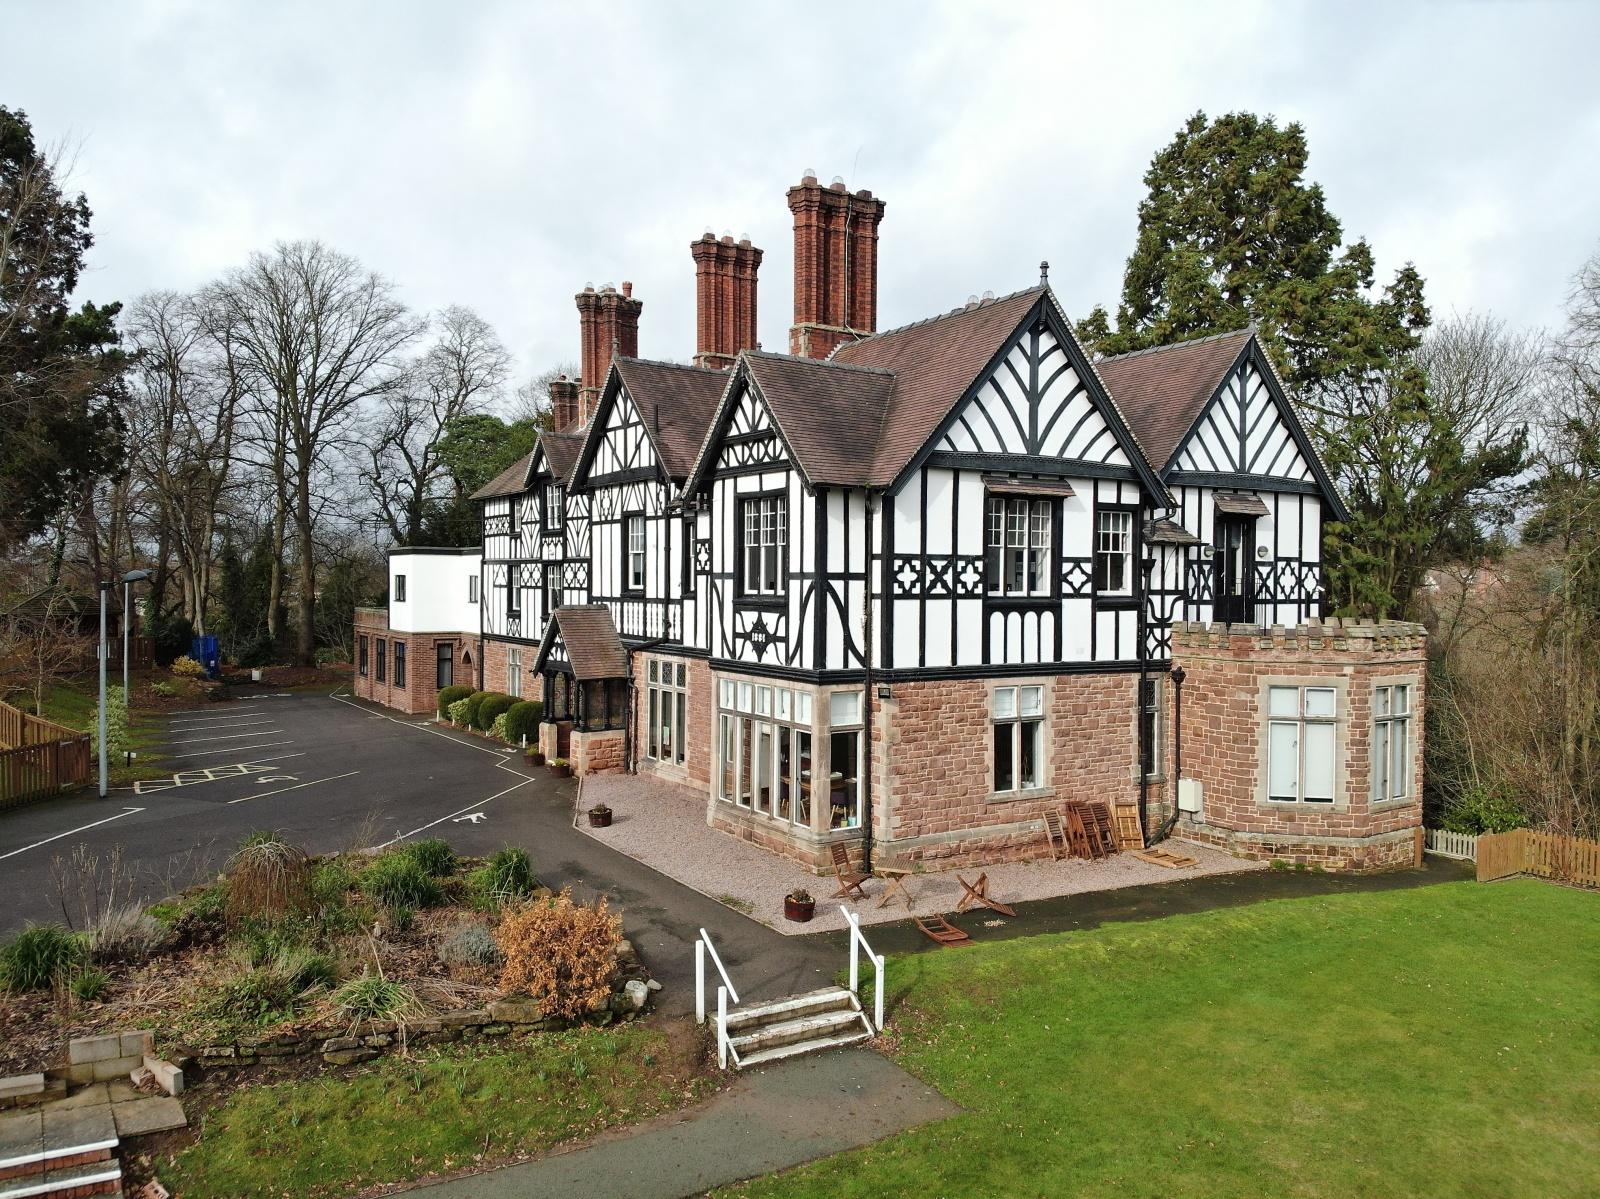 Kingsland Grange & Old Roman Road School Site, Old Roman Road, Shrewsbury, Shropshire